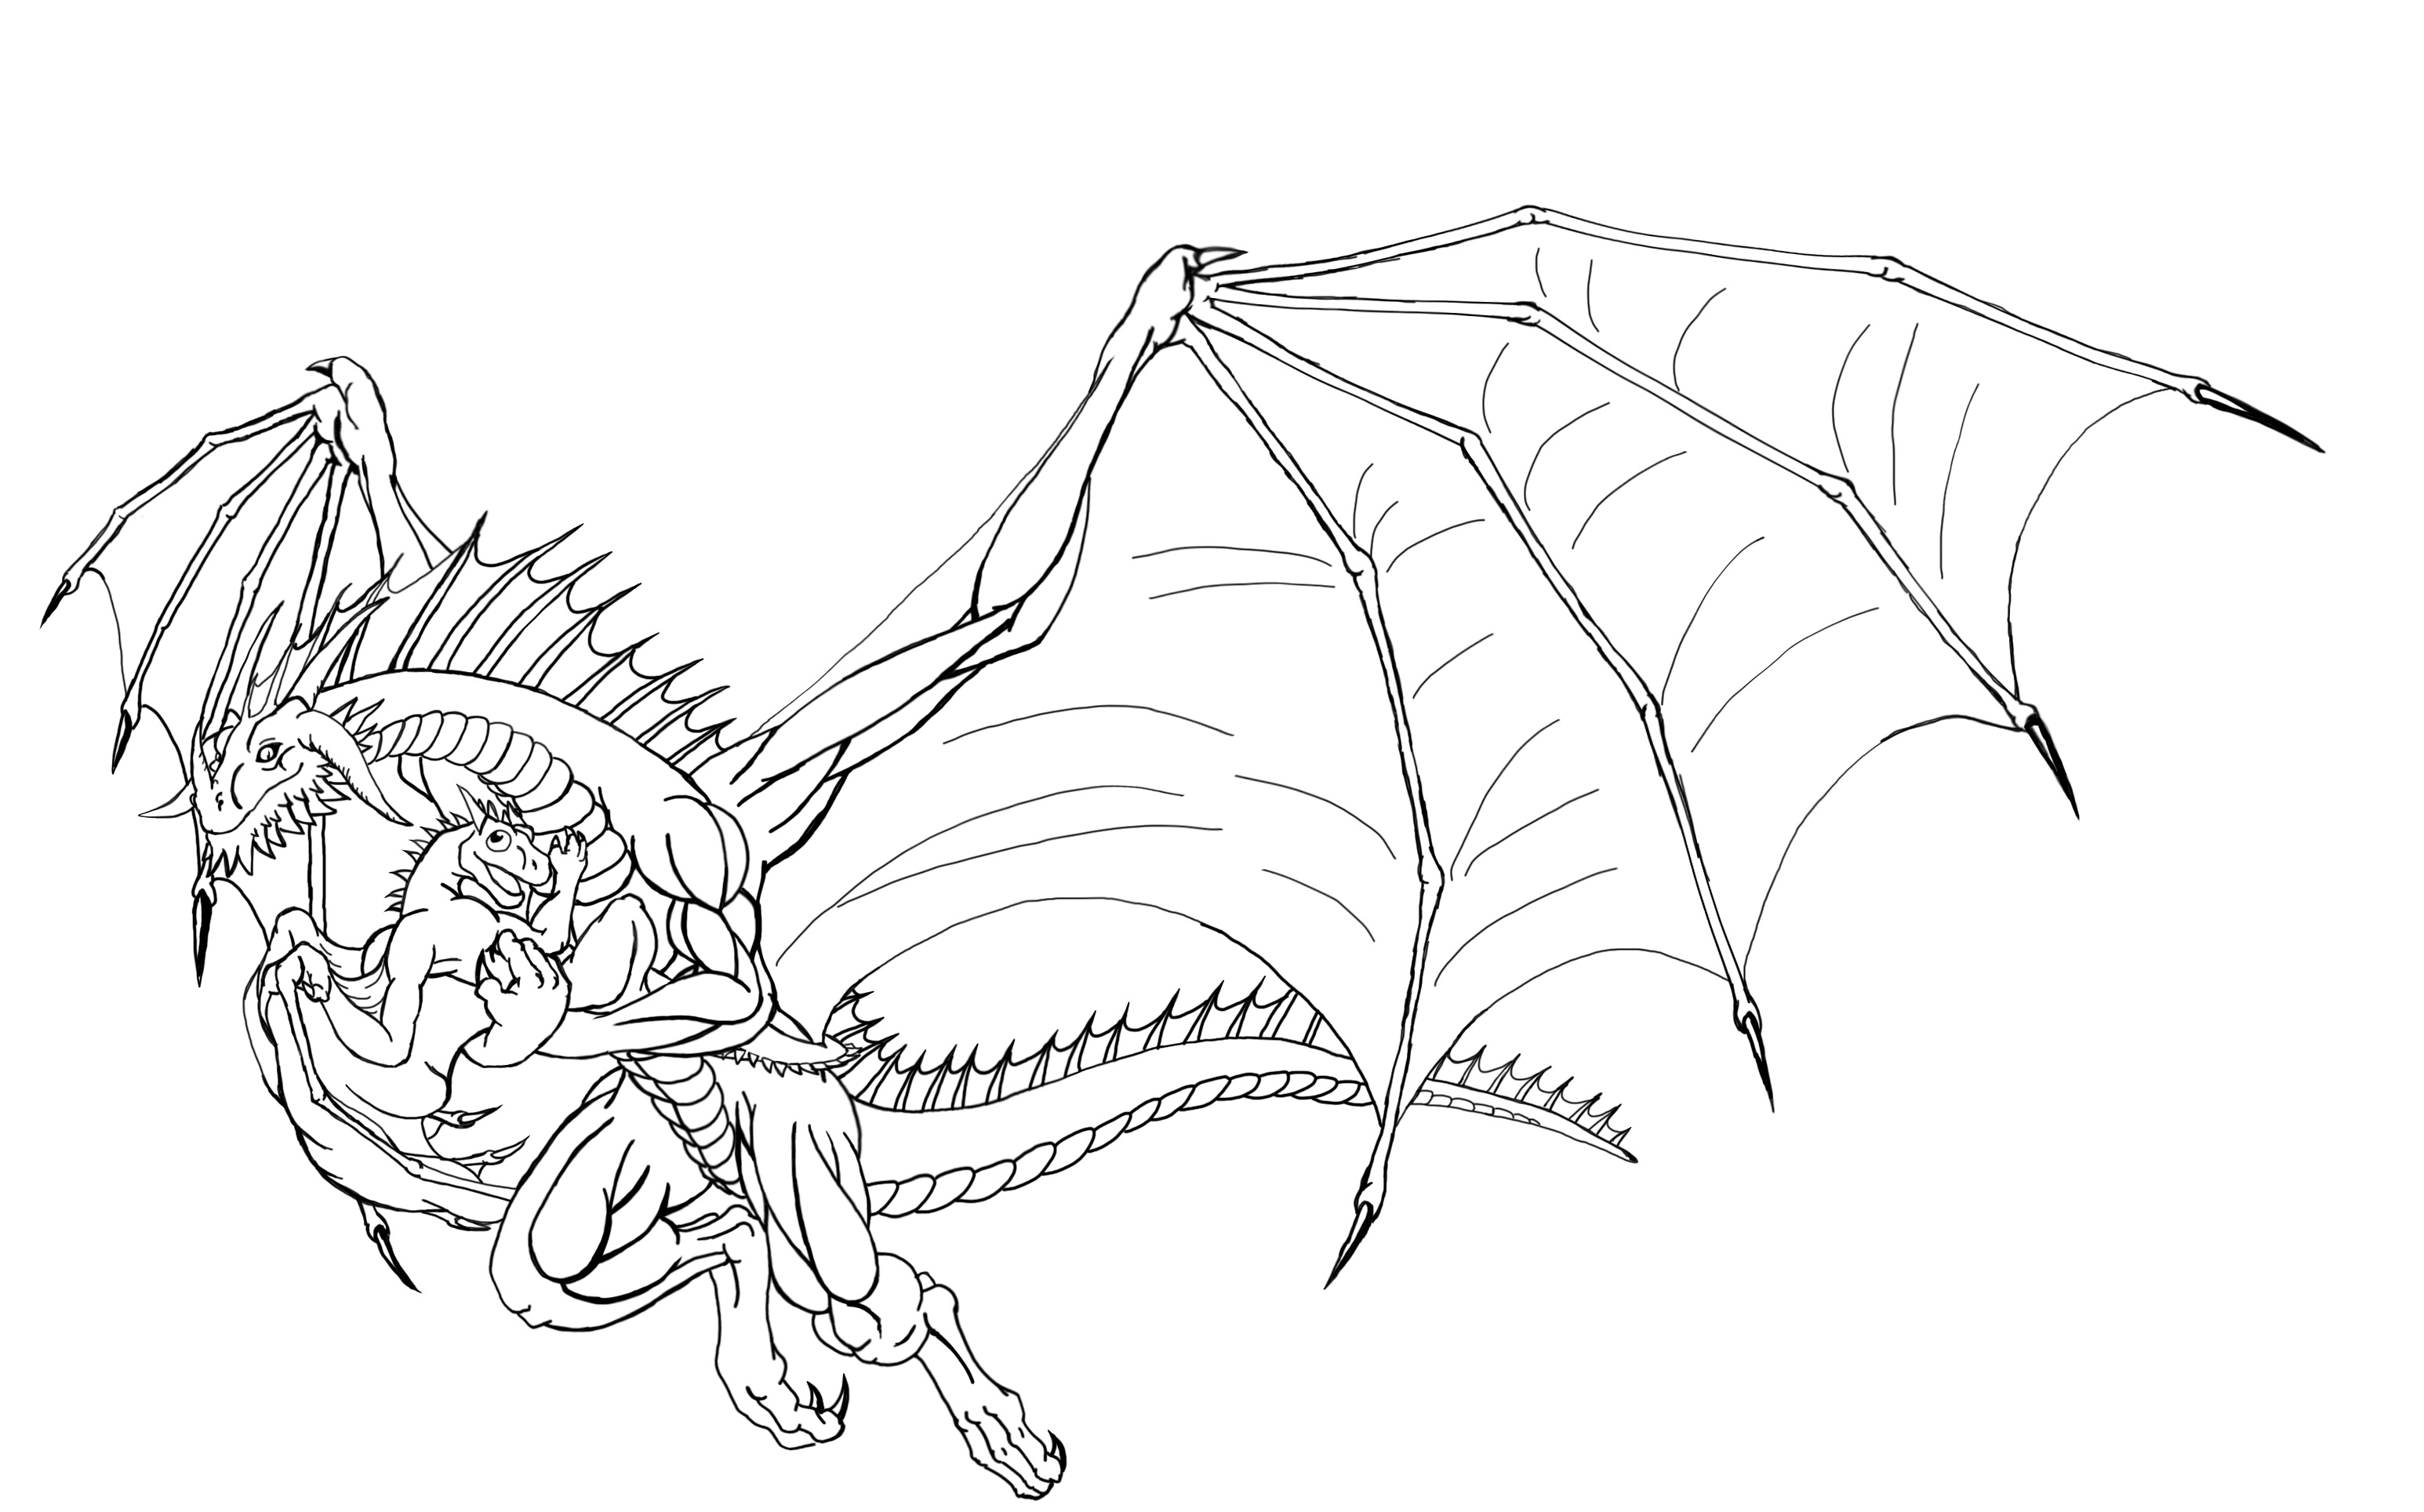 Line Art Dragon : Two dragons lineart by targonreddragon on deviantart